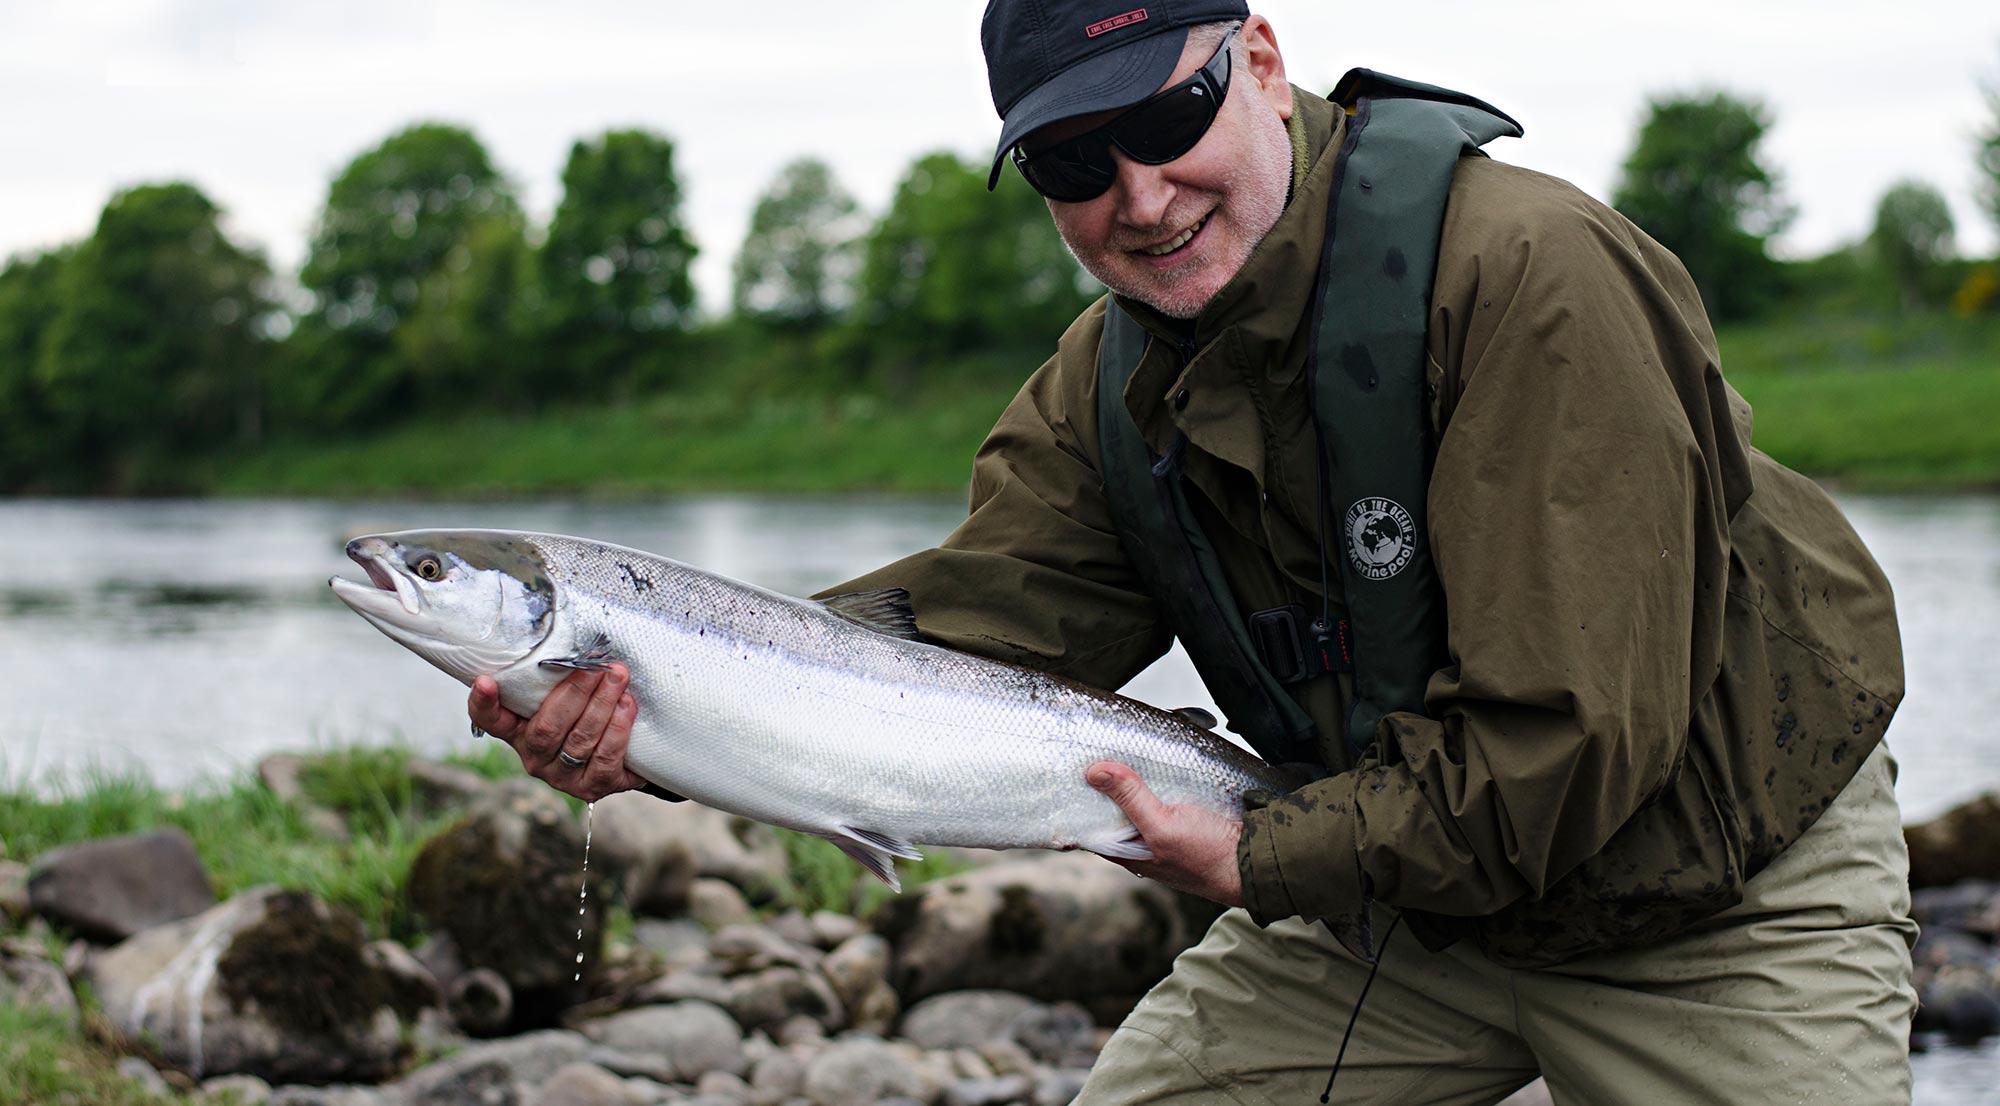 Salmon, River Tay, Fishing Guide, Orvis, Alba Game Fishing